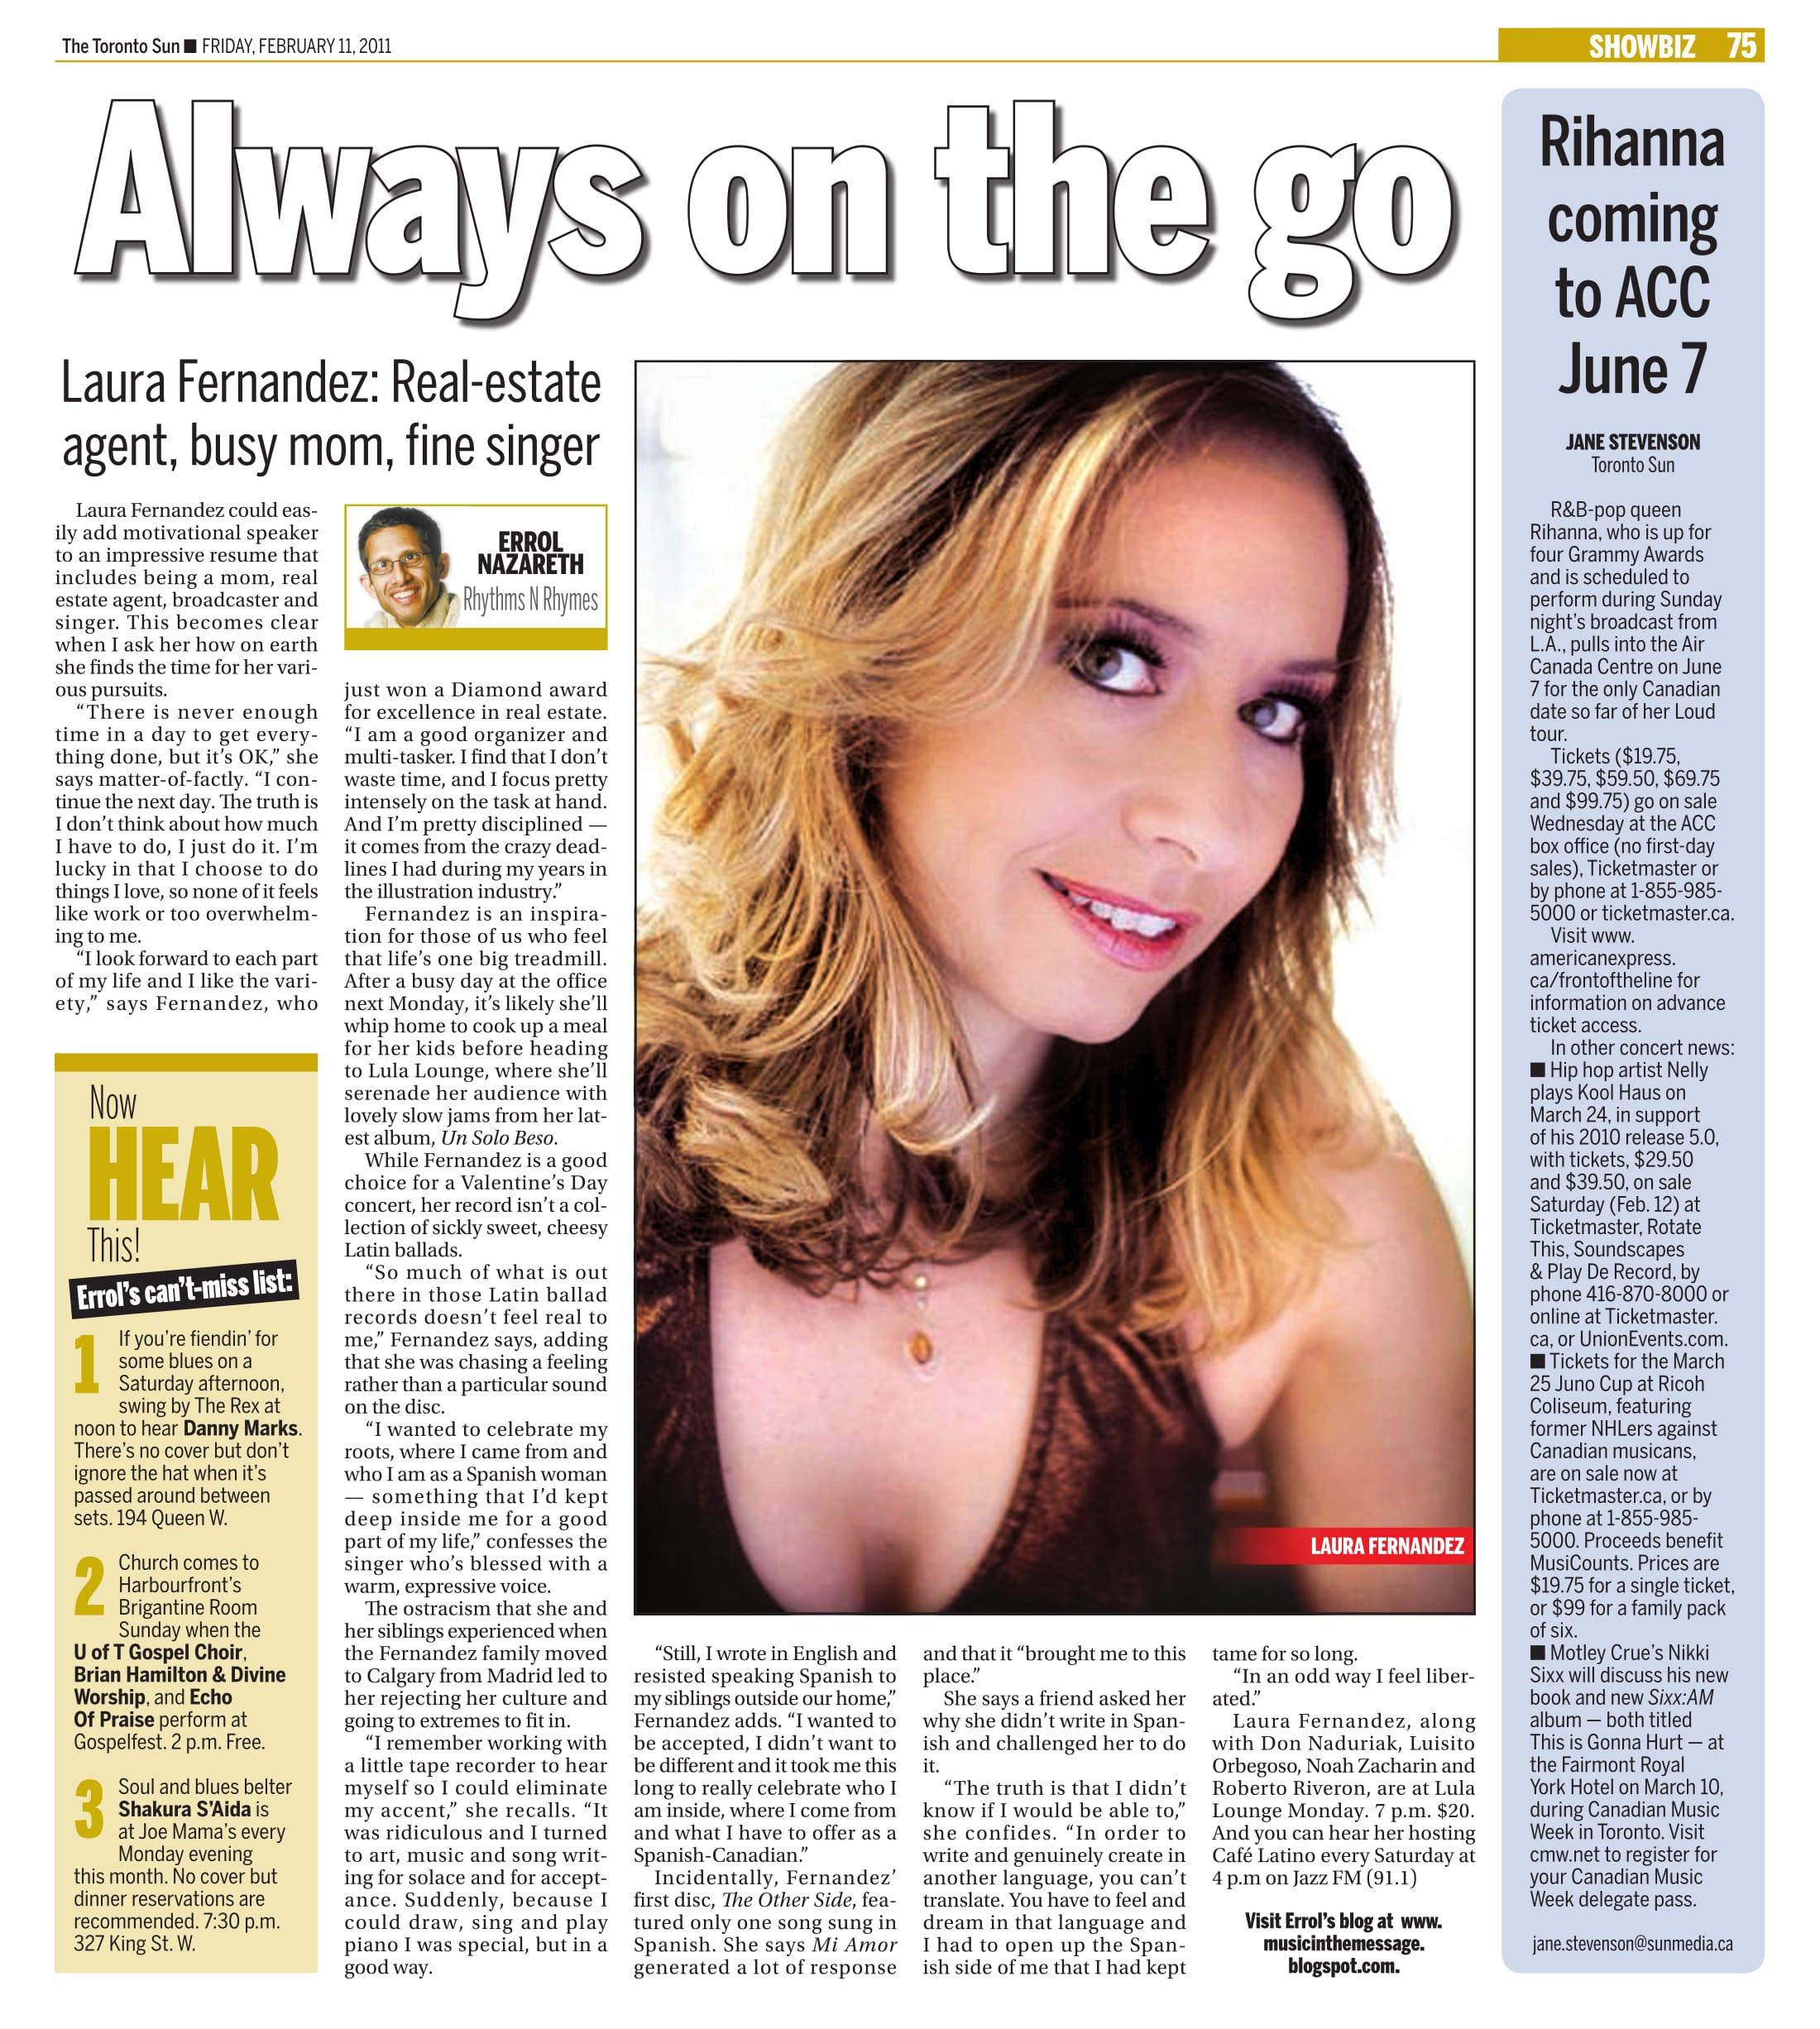 Laura Fernandez Toronto Sun Profile